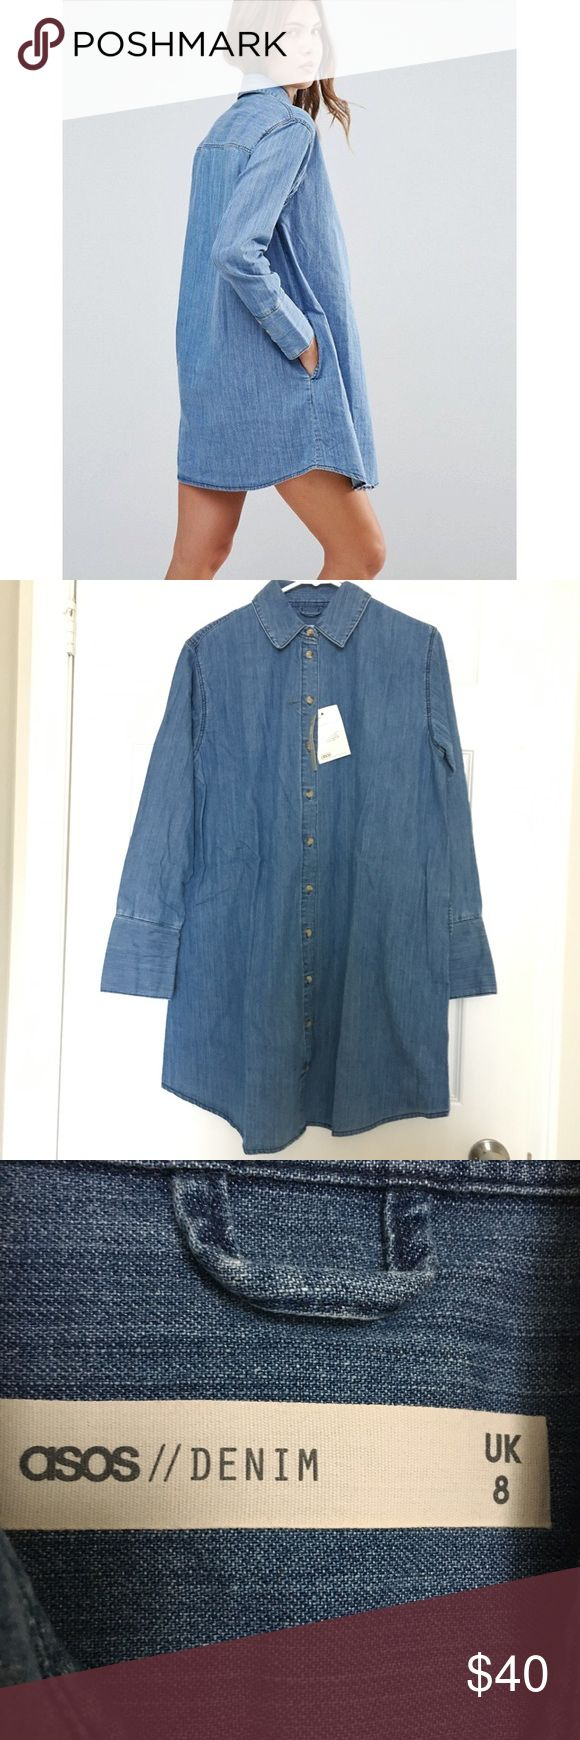 ASOS Denim Shirt Dress NWT denim shirt dress. Super cute Spring dress. Never worn with original tags and packaging. UK 8 = US 4 ASOS Dresses Mini